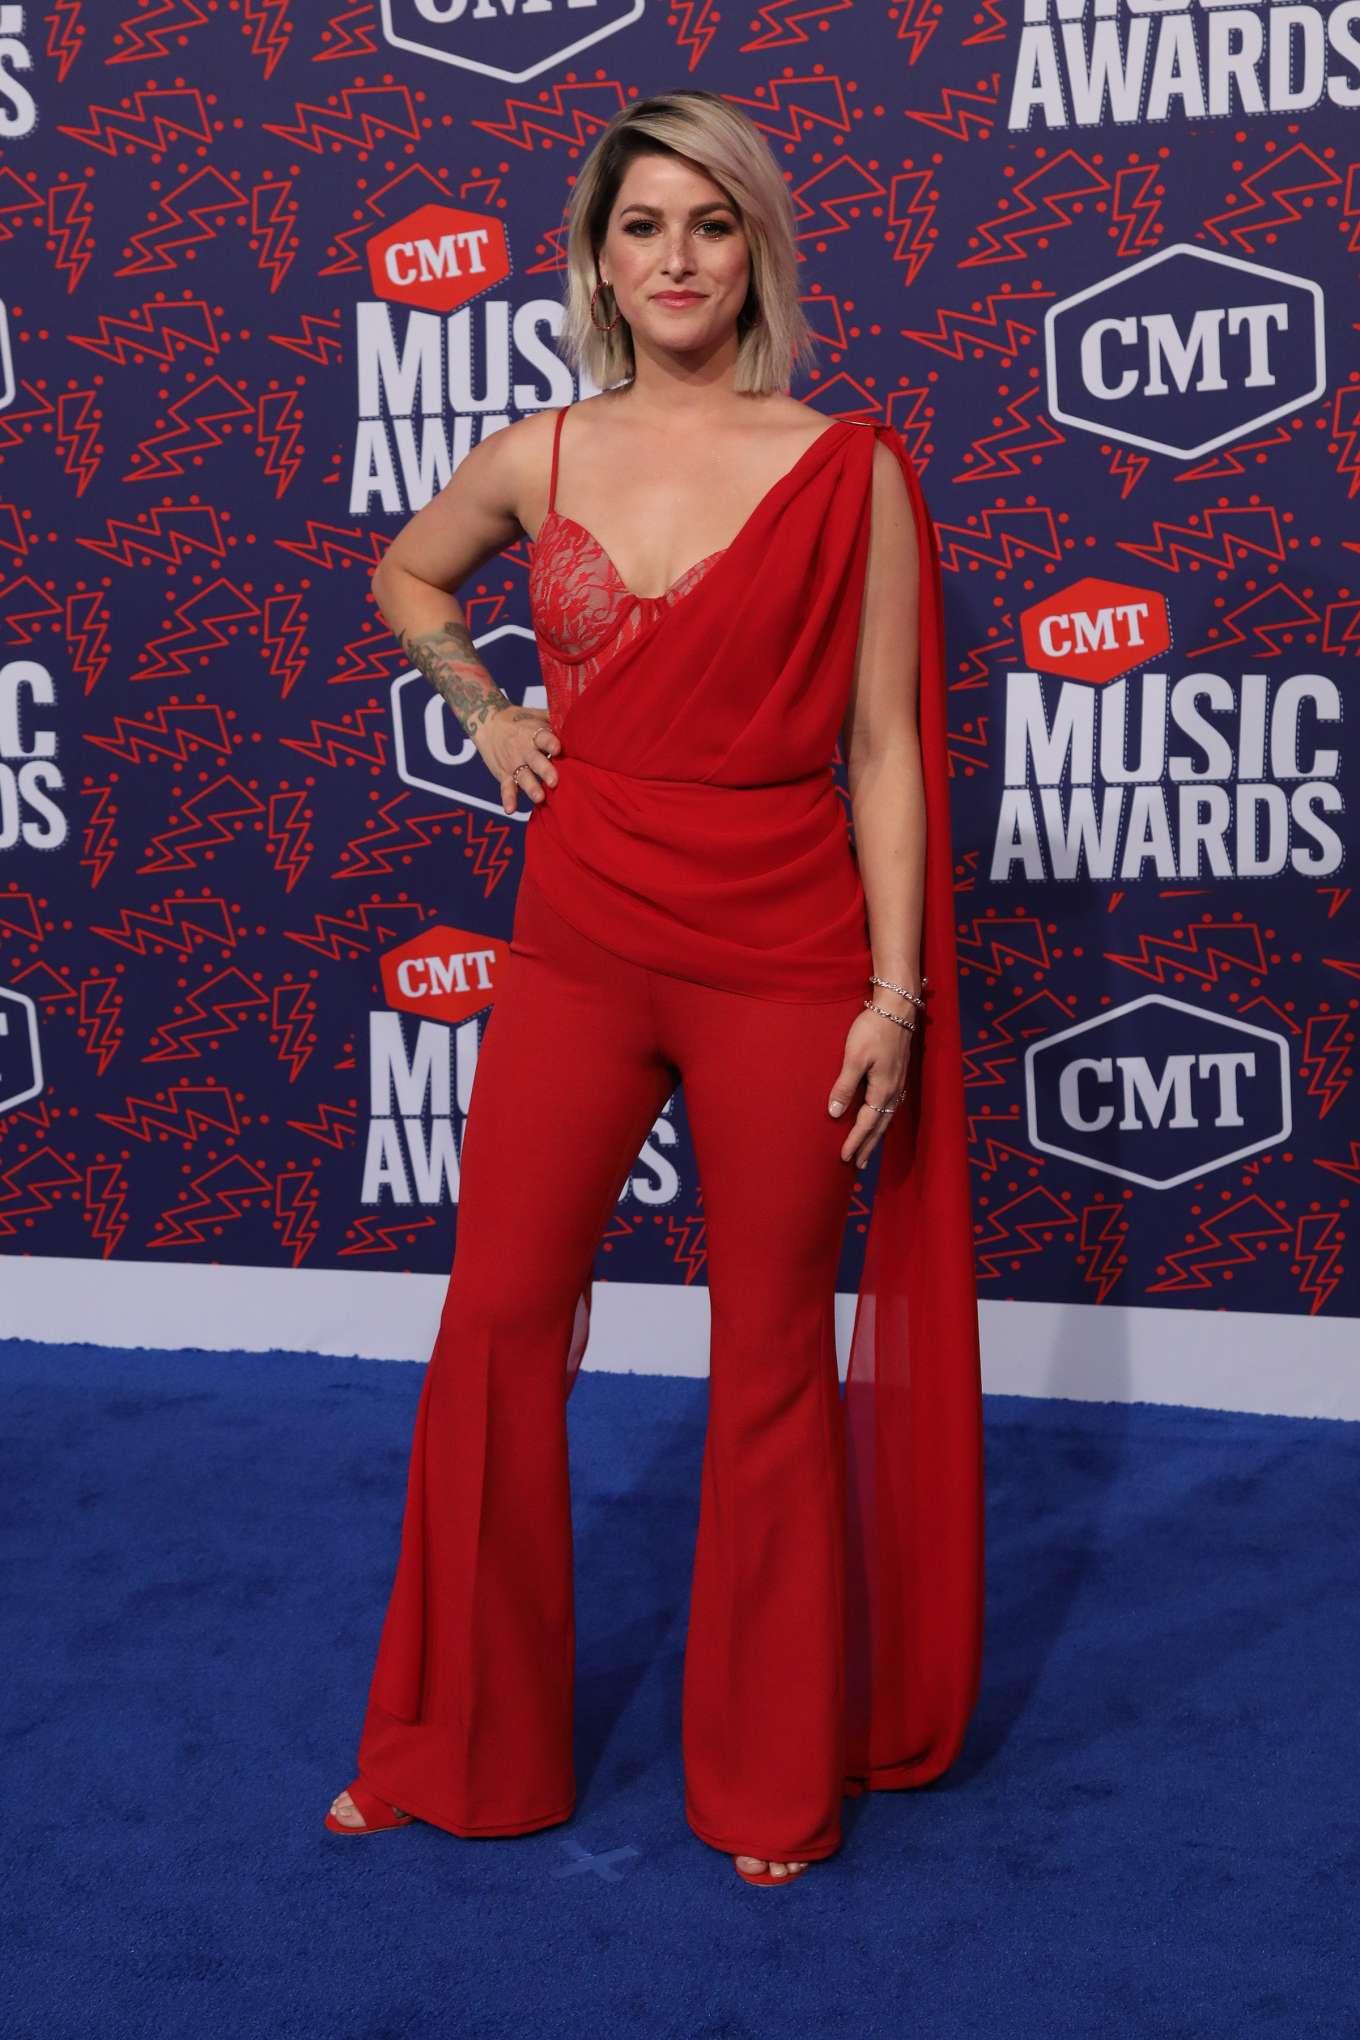 Cassadee Pope 2019 : Cassadee Pope: 2019 CMT Music Awards-02